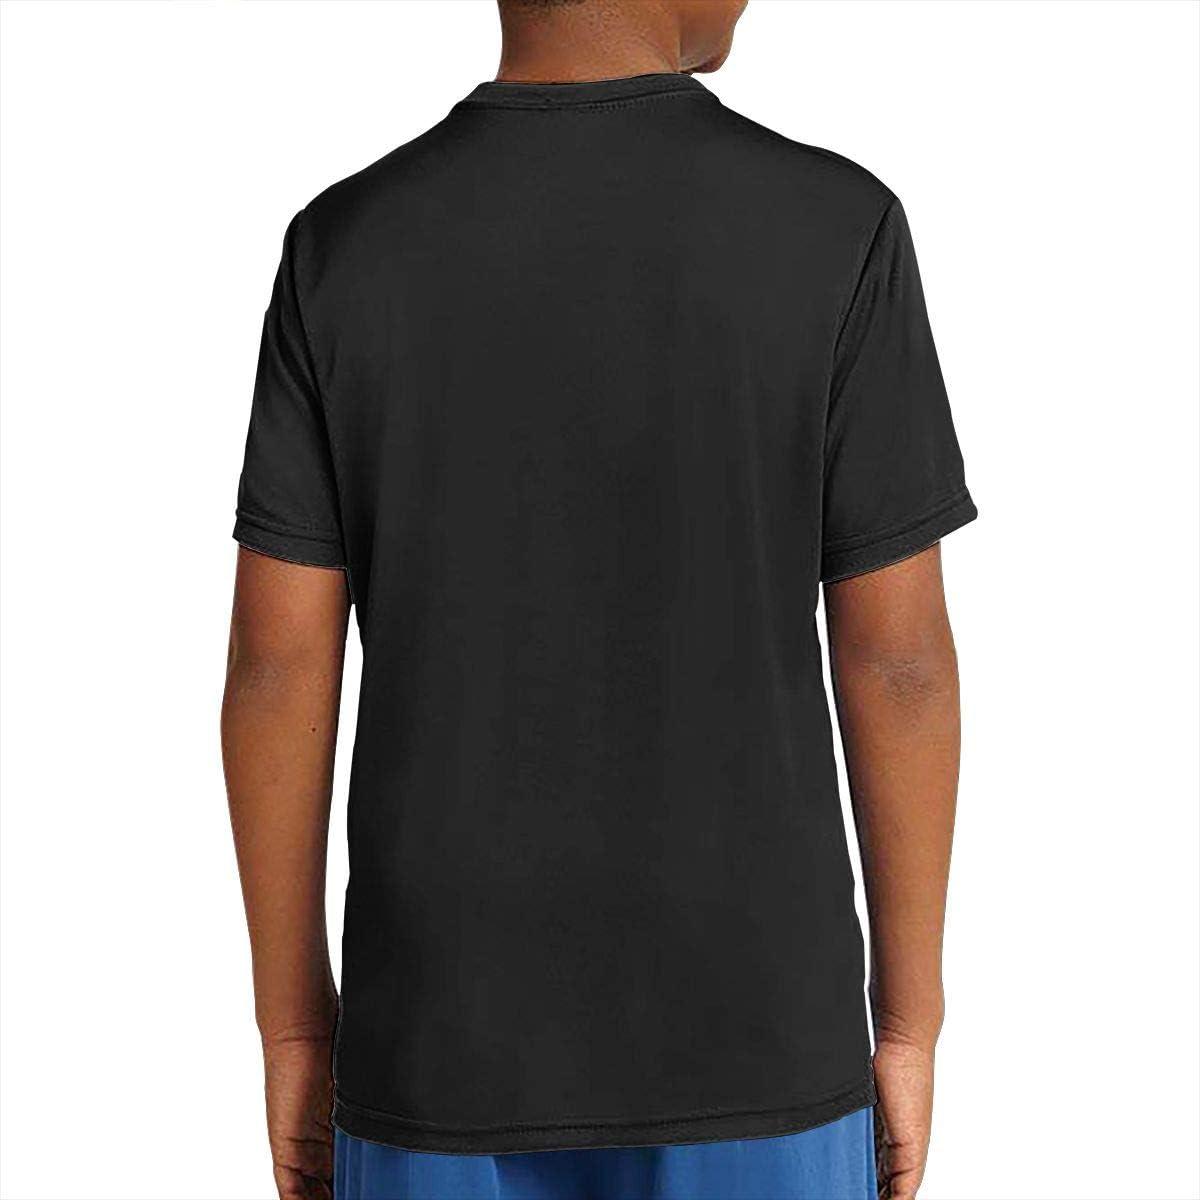 JosephHenkle Youth Boys Girls Short-Sleeve T-Shirts Adolescent Tee Black Tops